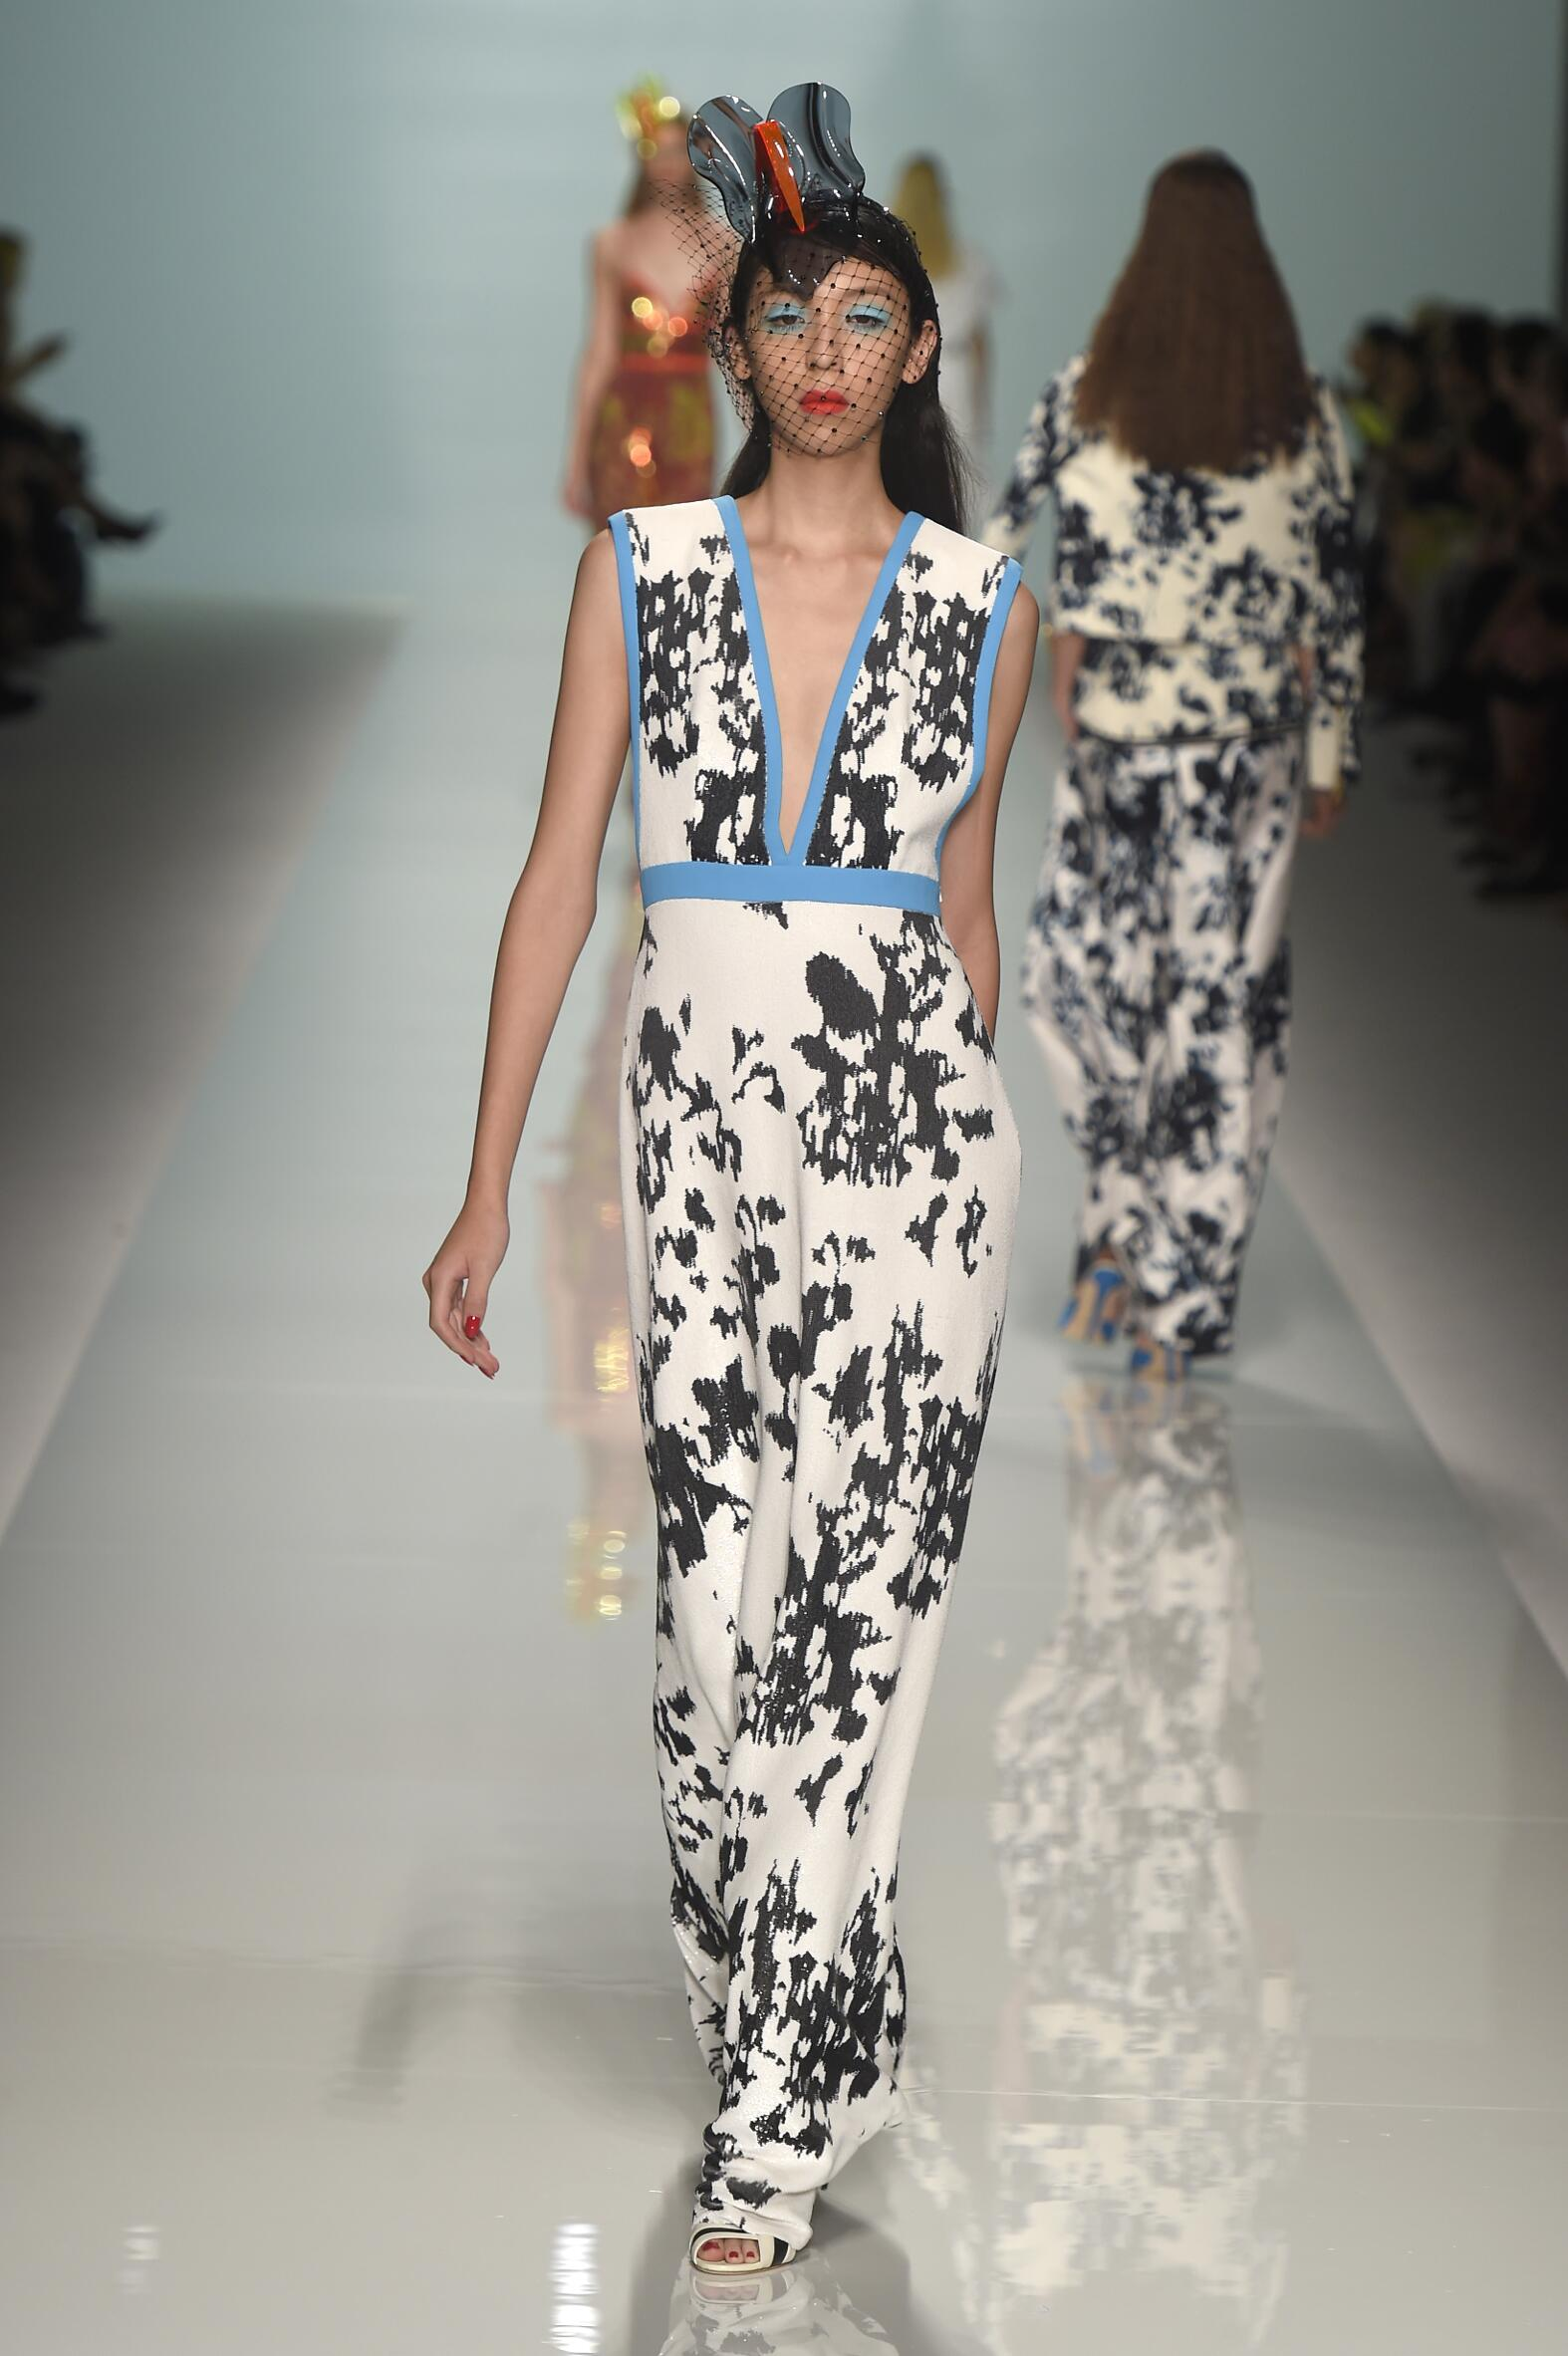 2015 Catwalk Emanuel Ungaro Woman Fashion Show Summer